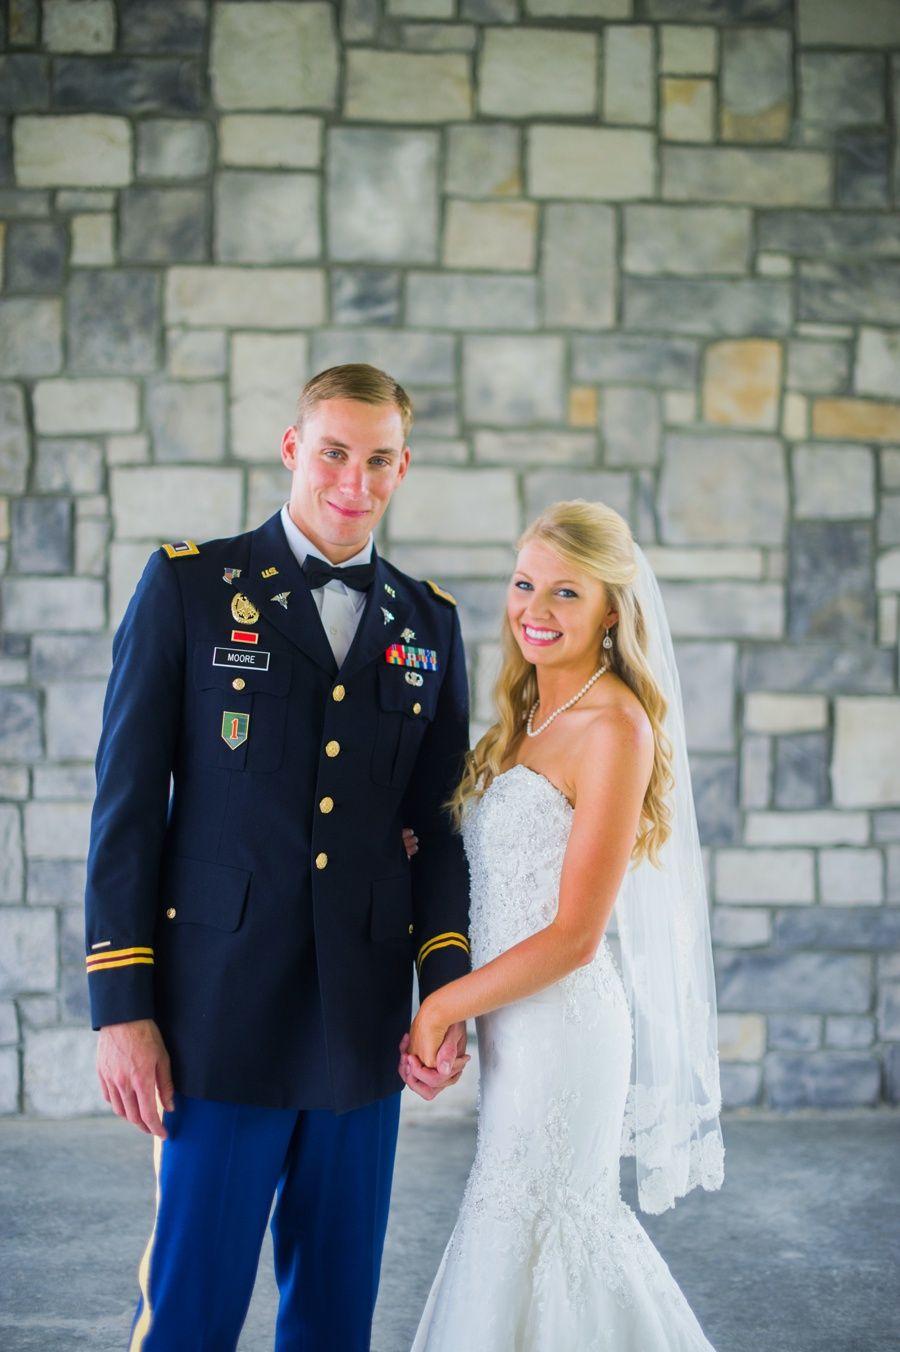 Military Wedding Morehead Ky First Look Military Wedding Bridesmaid Dresses Wedding